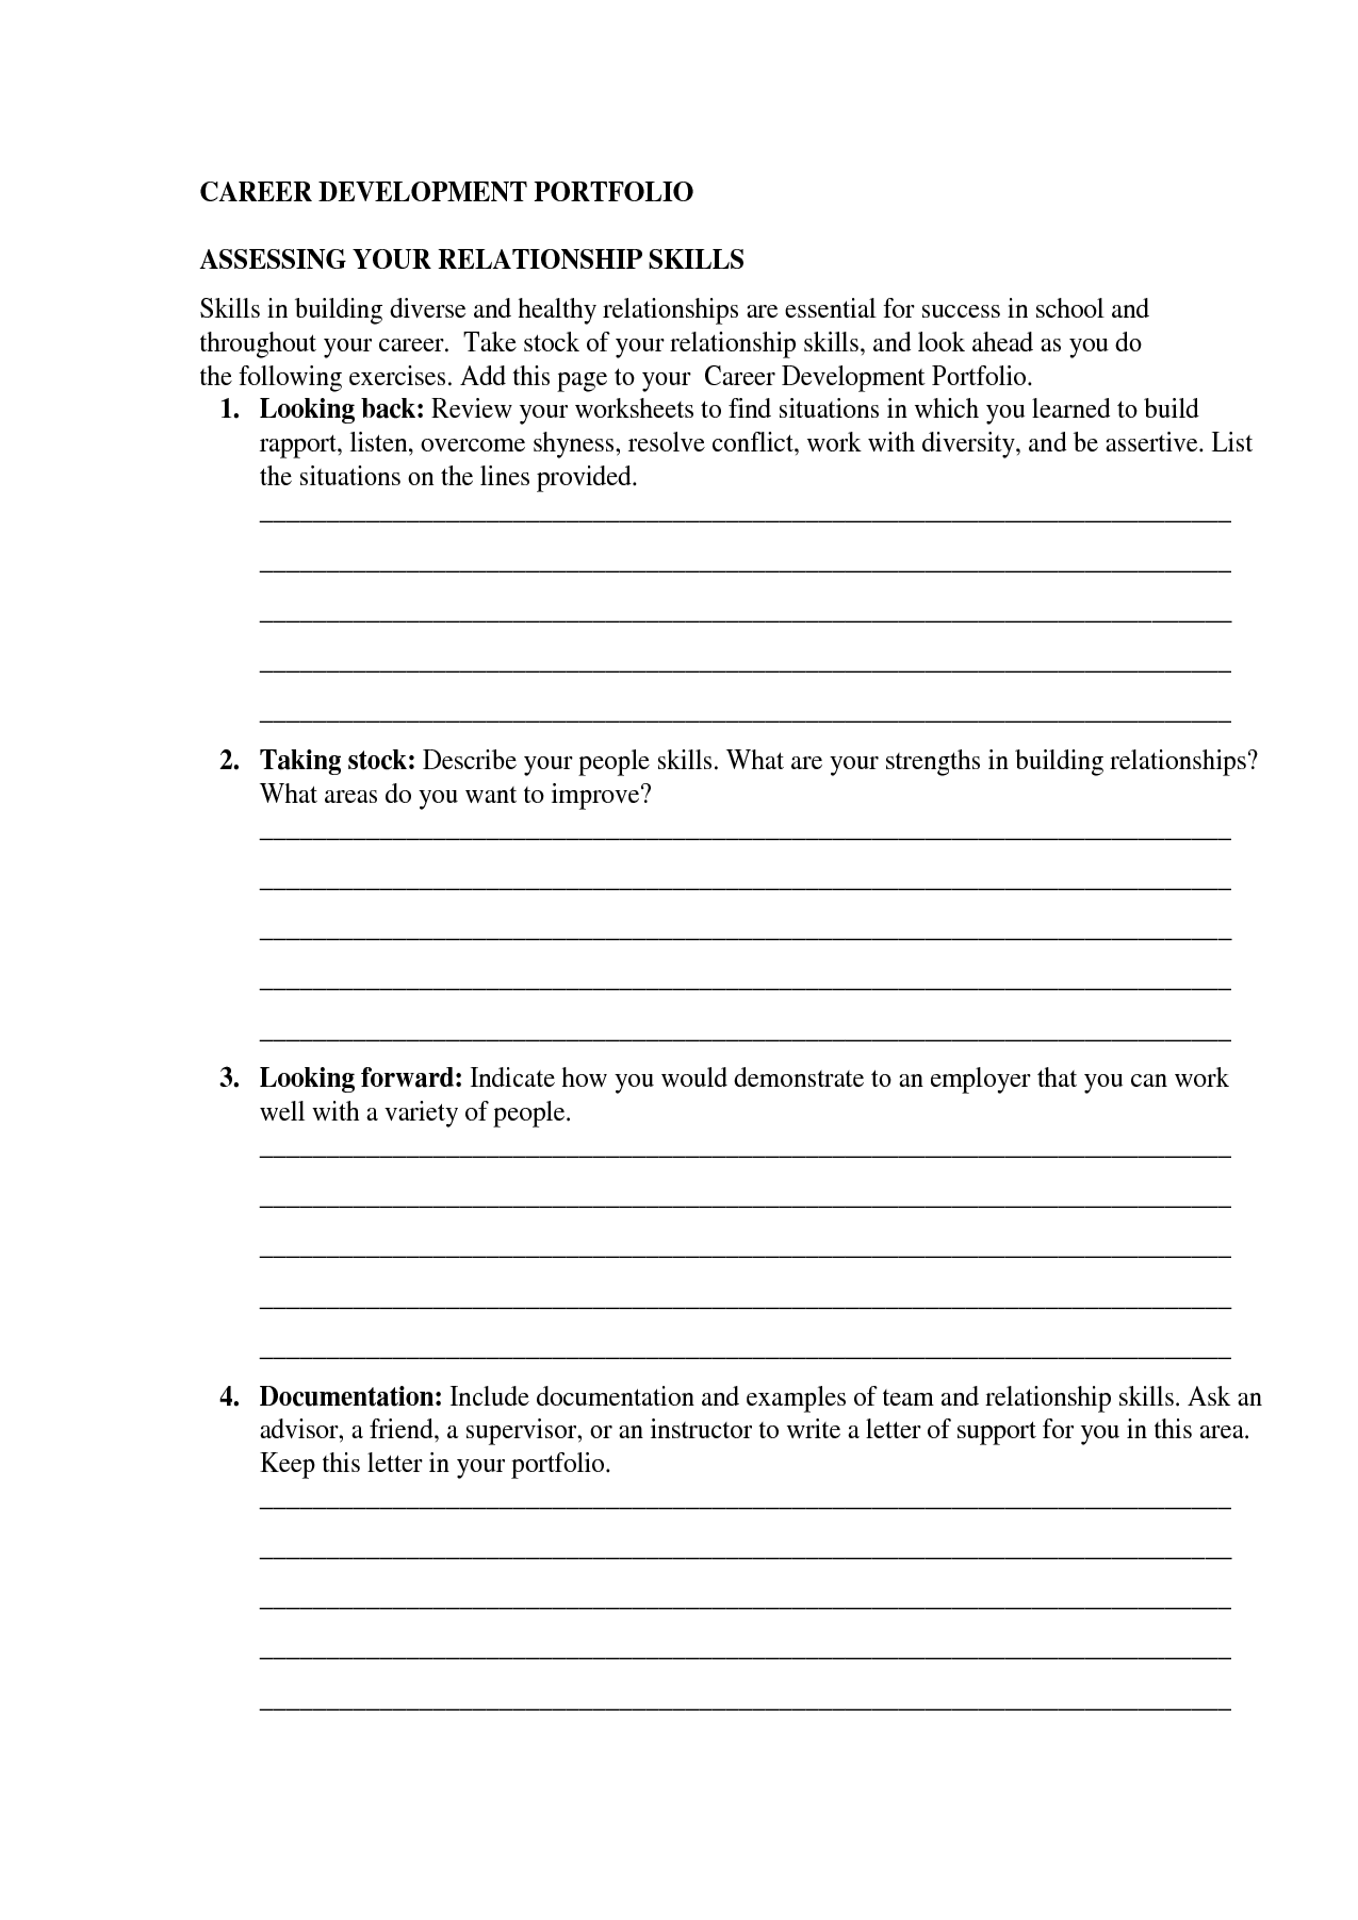 photo regarding Healthy Relationship Quiz Printable known as √ Romantic relationship Worksheets Romantic relationship Producing: Shared